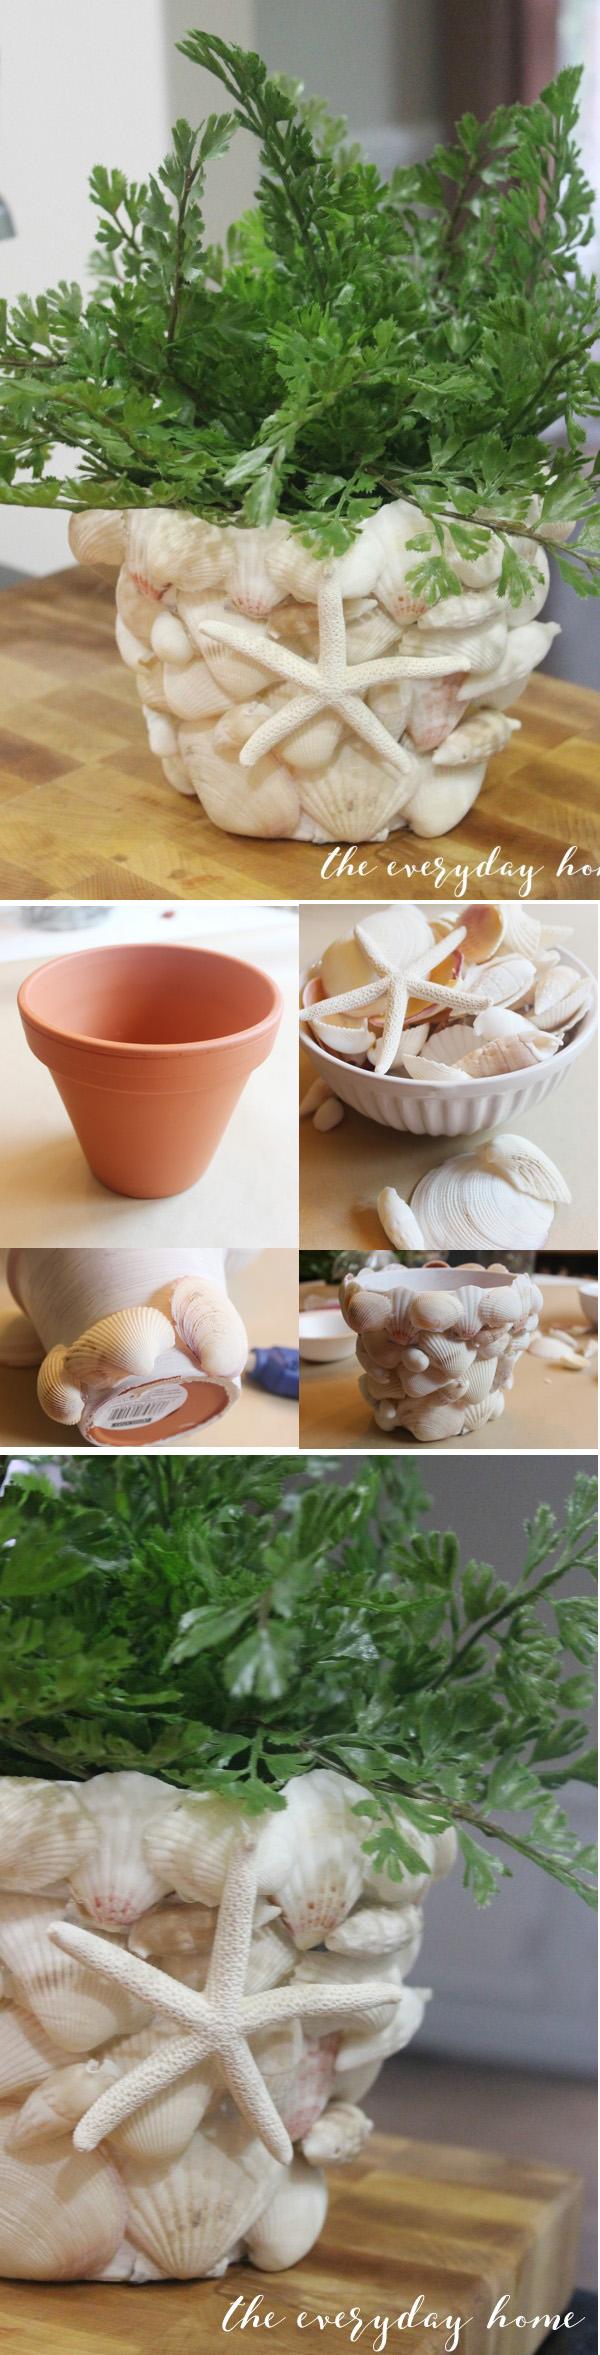 DIY ιδέες με γλάστρες31